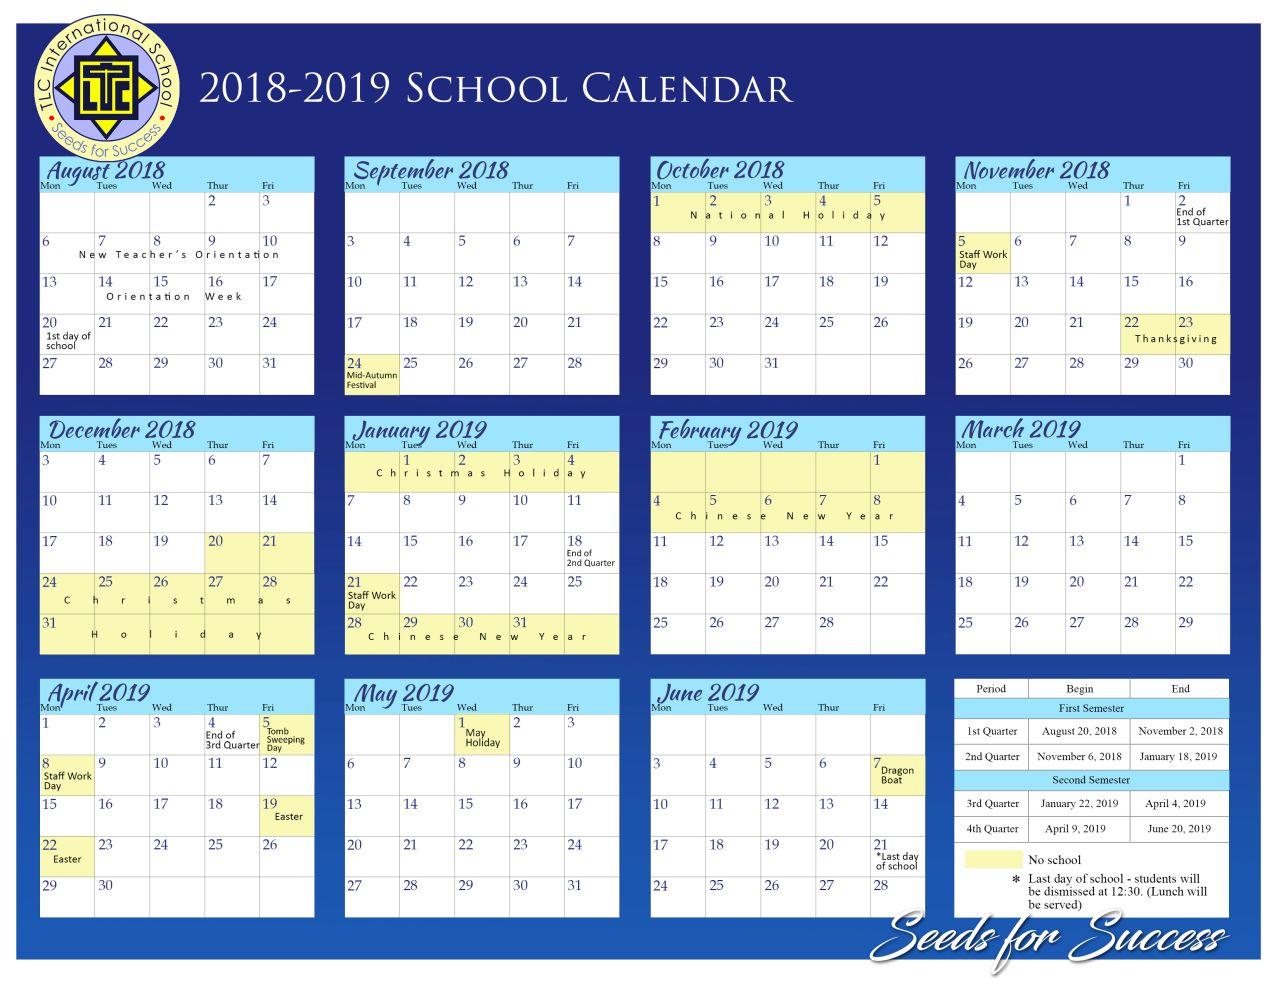 TLC School Calendar 2018-2019